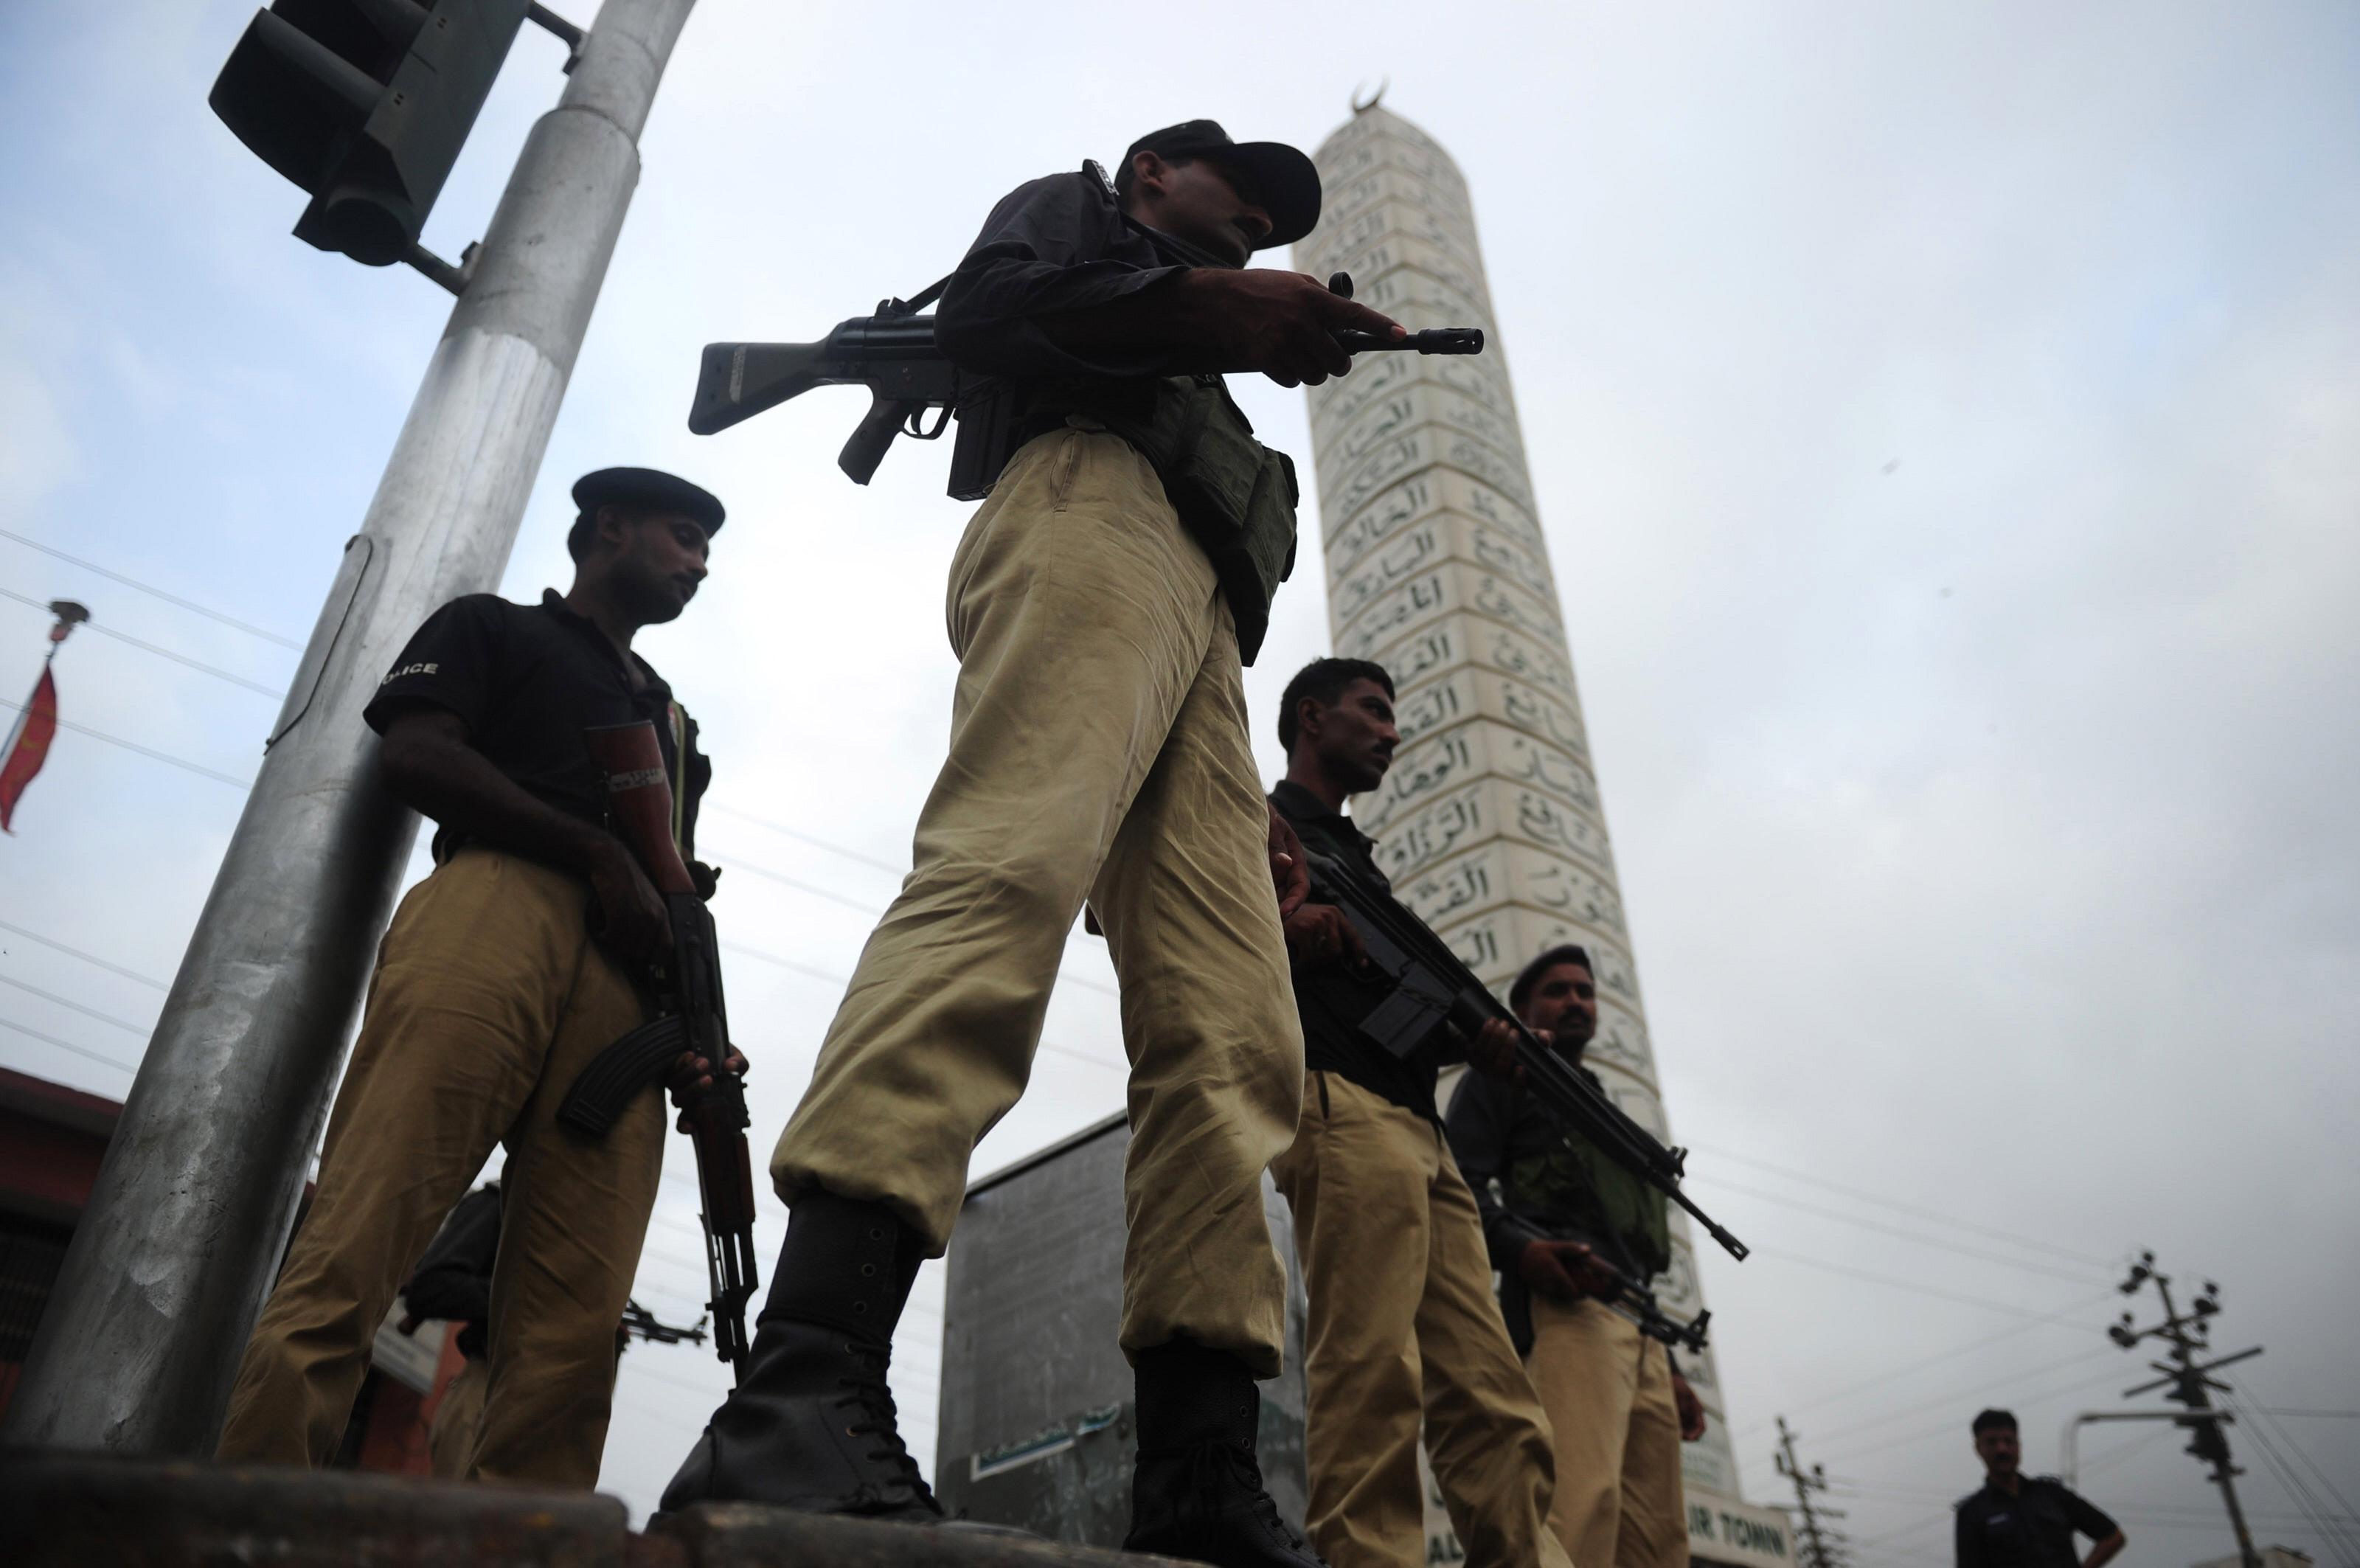 Pakistani policemen stand guard in a troubled neighbourhood in Karachi. PHOTO: AFP